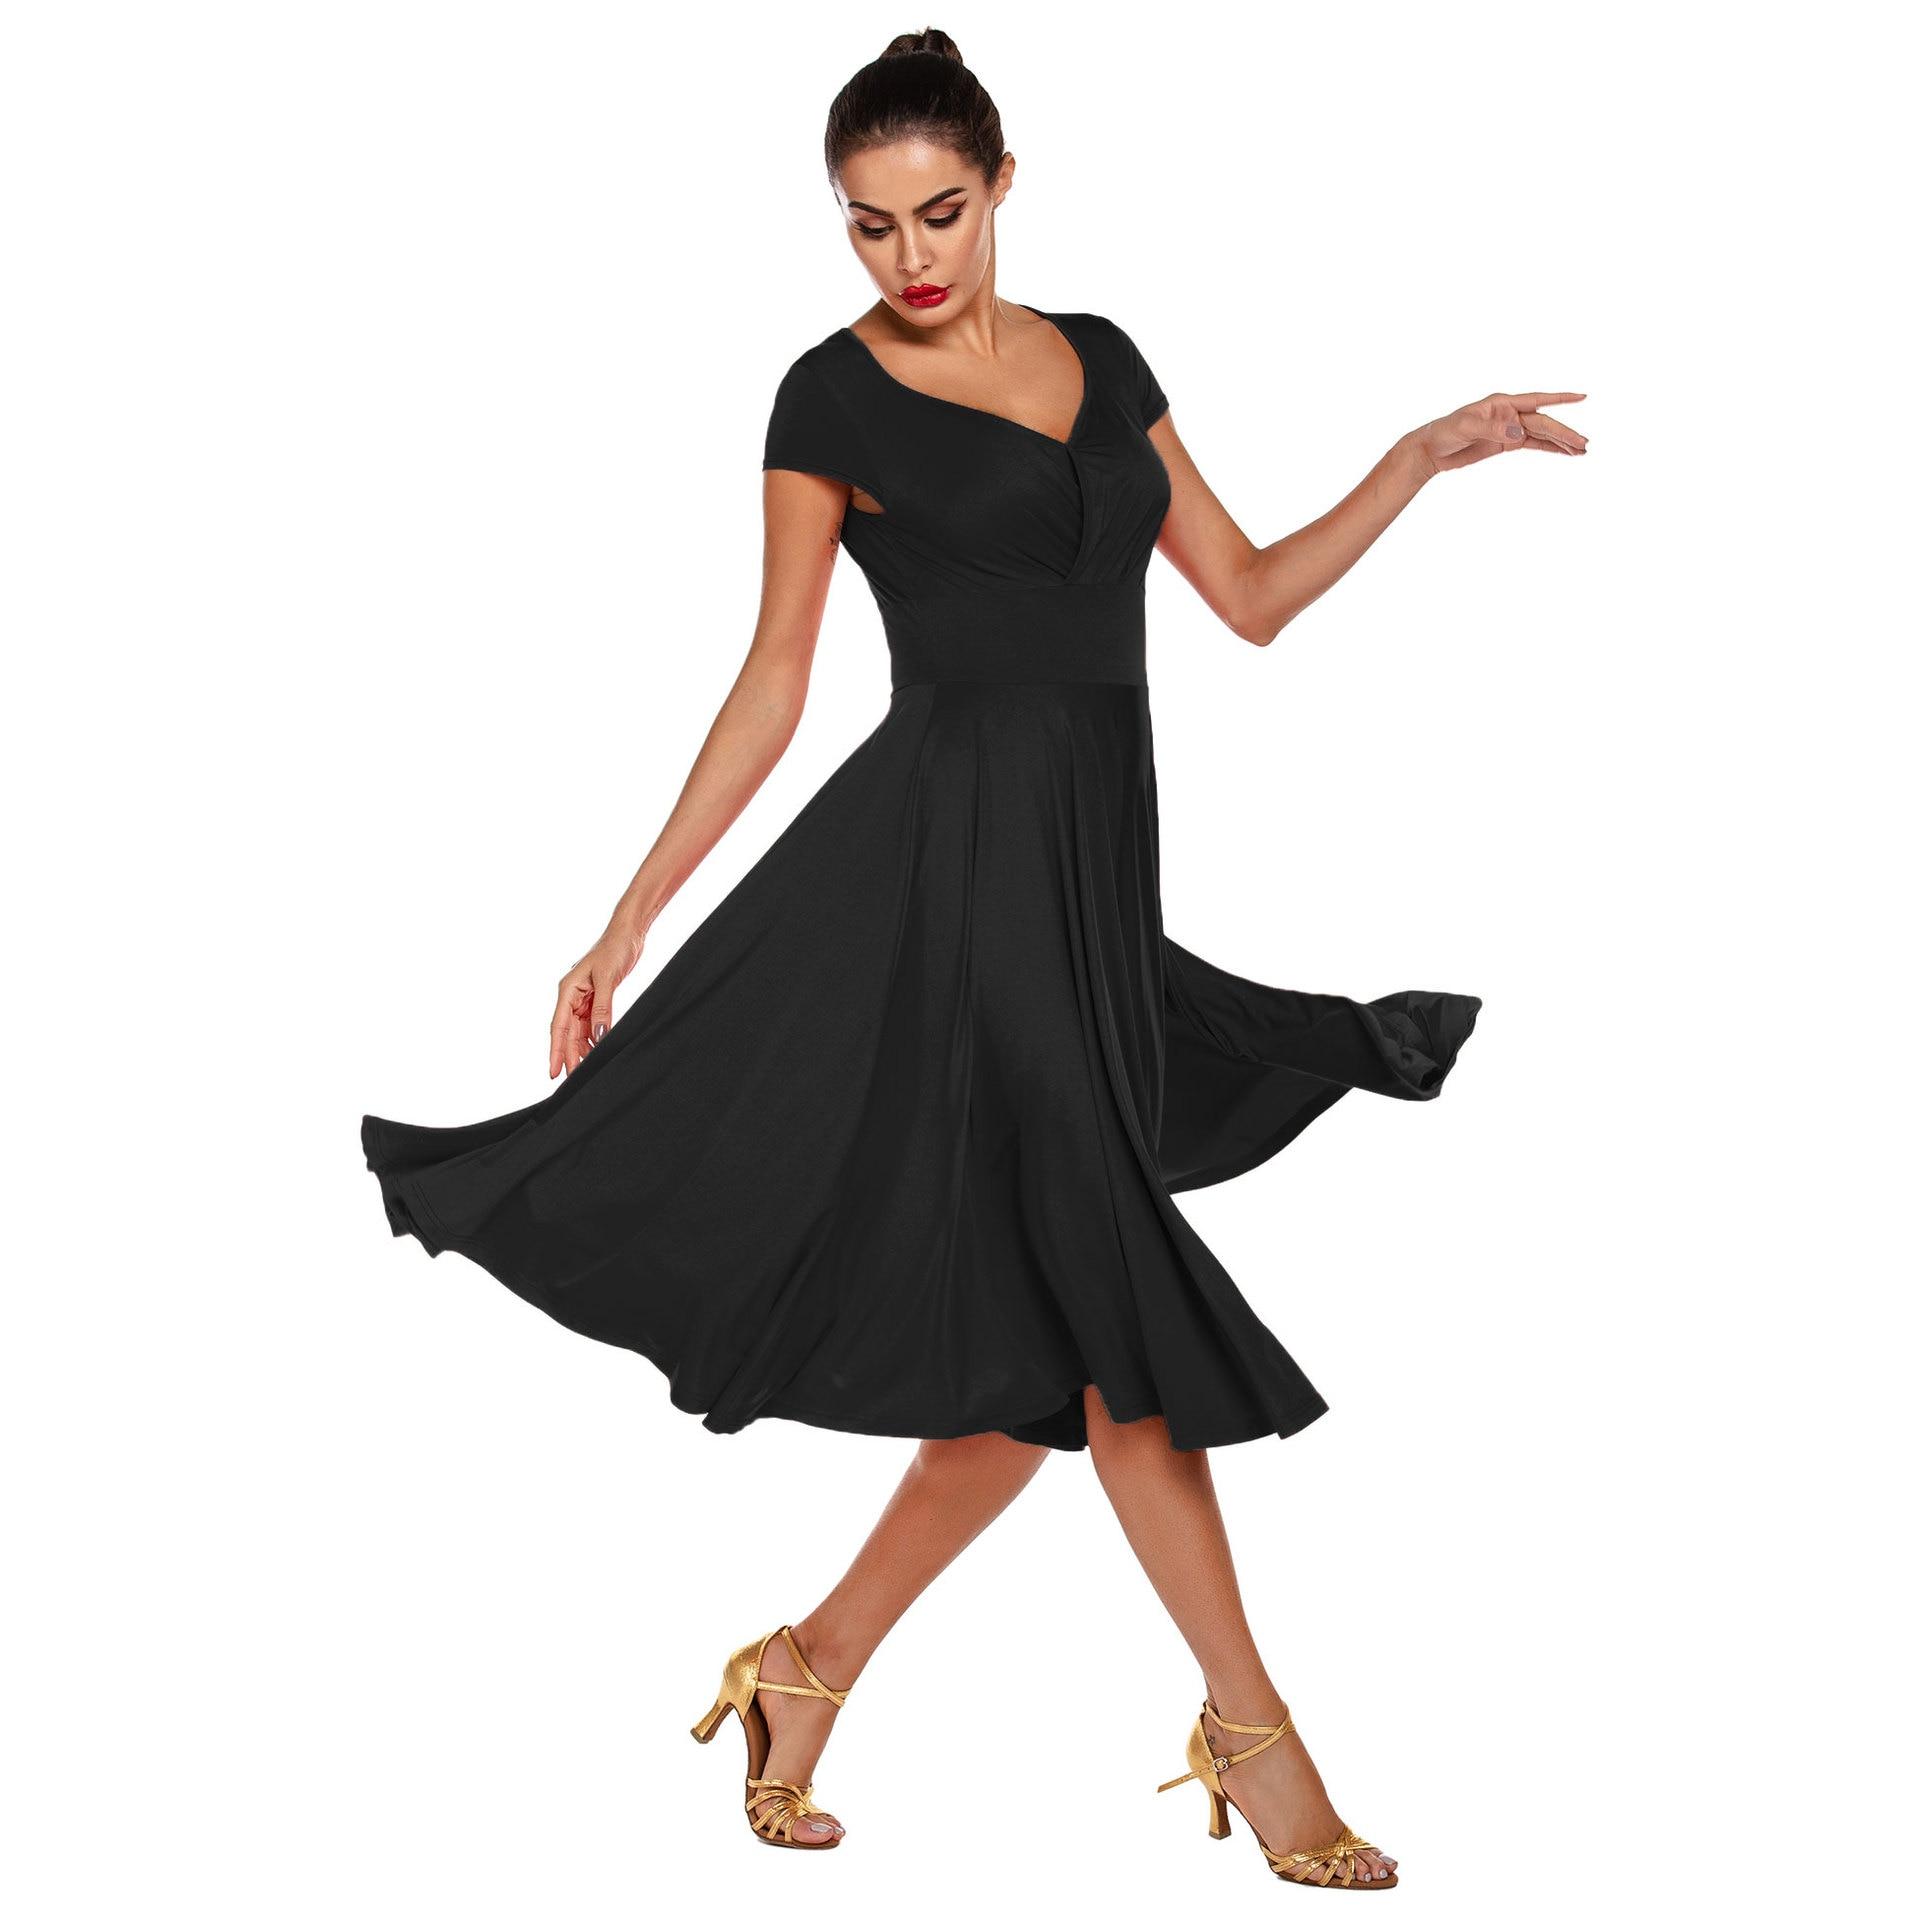 2020 New Woman Latin Dance Dress Adult Ballroom Dance Big Swing Skirt High Quality Dance Costume Drop Shipping